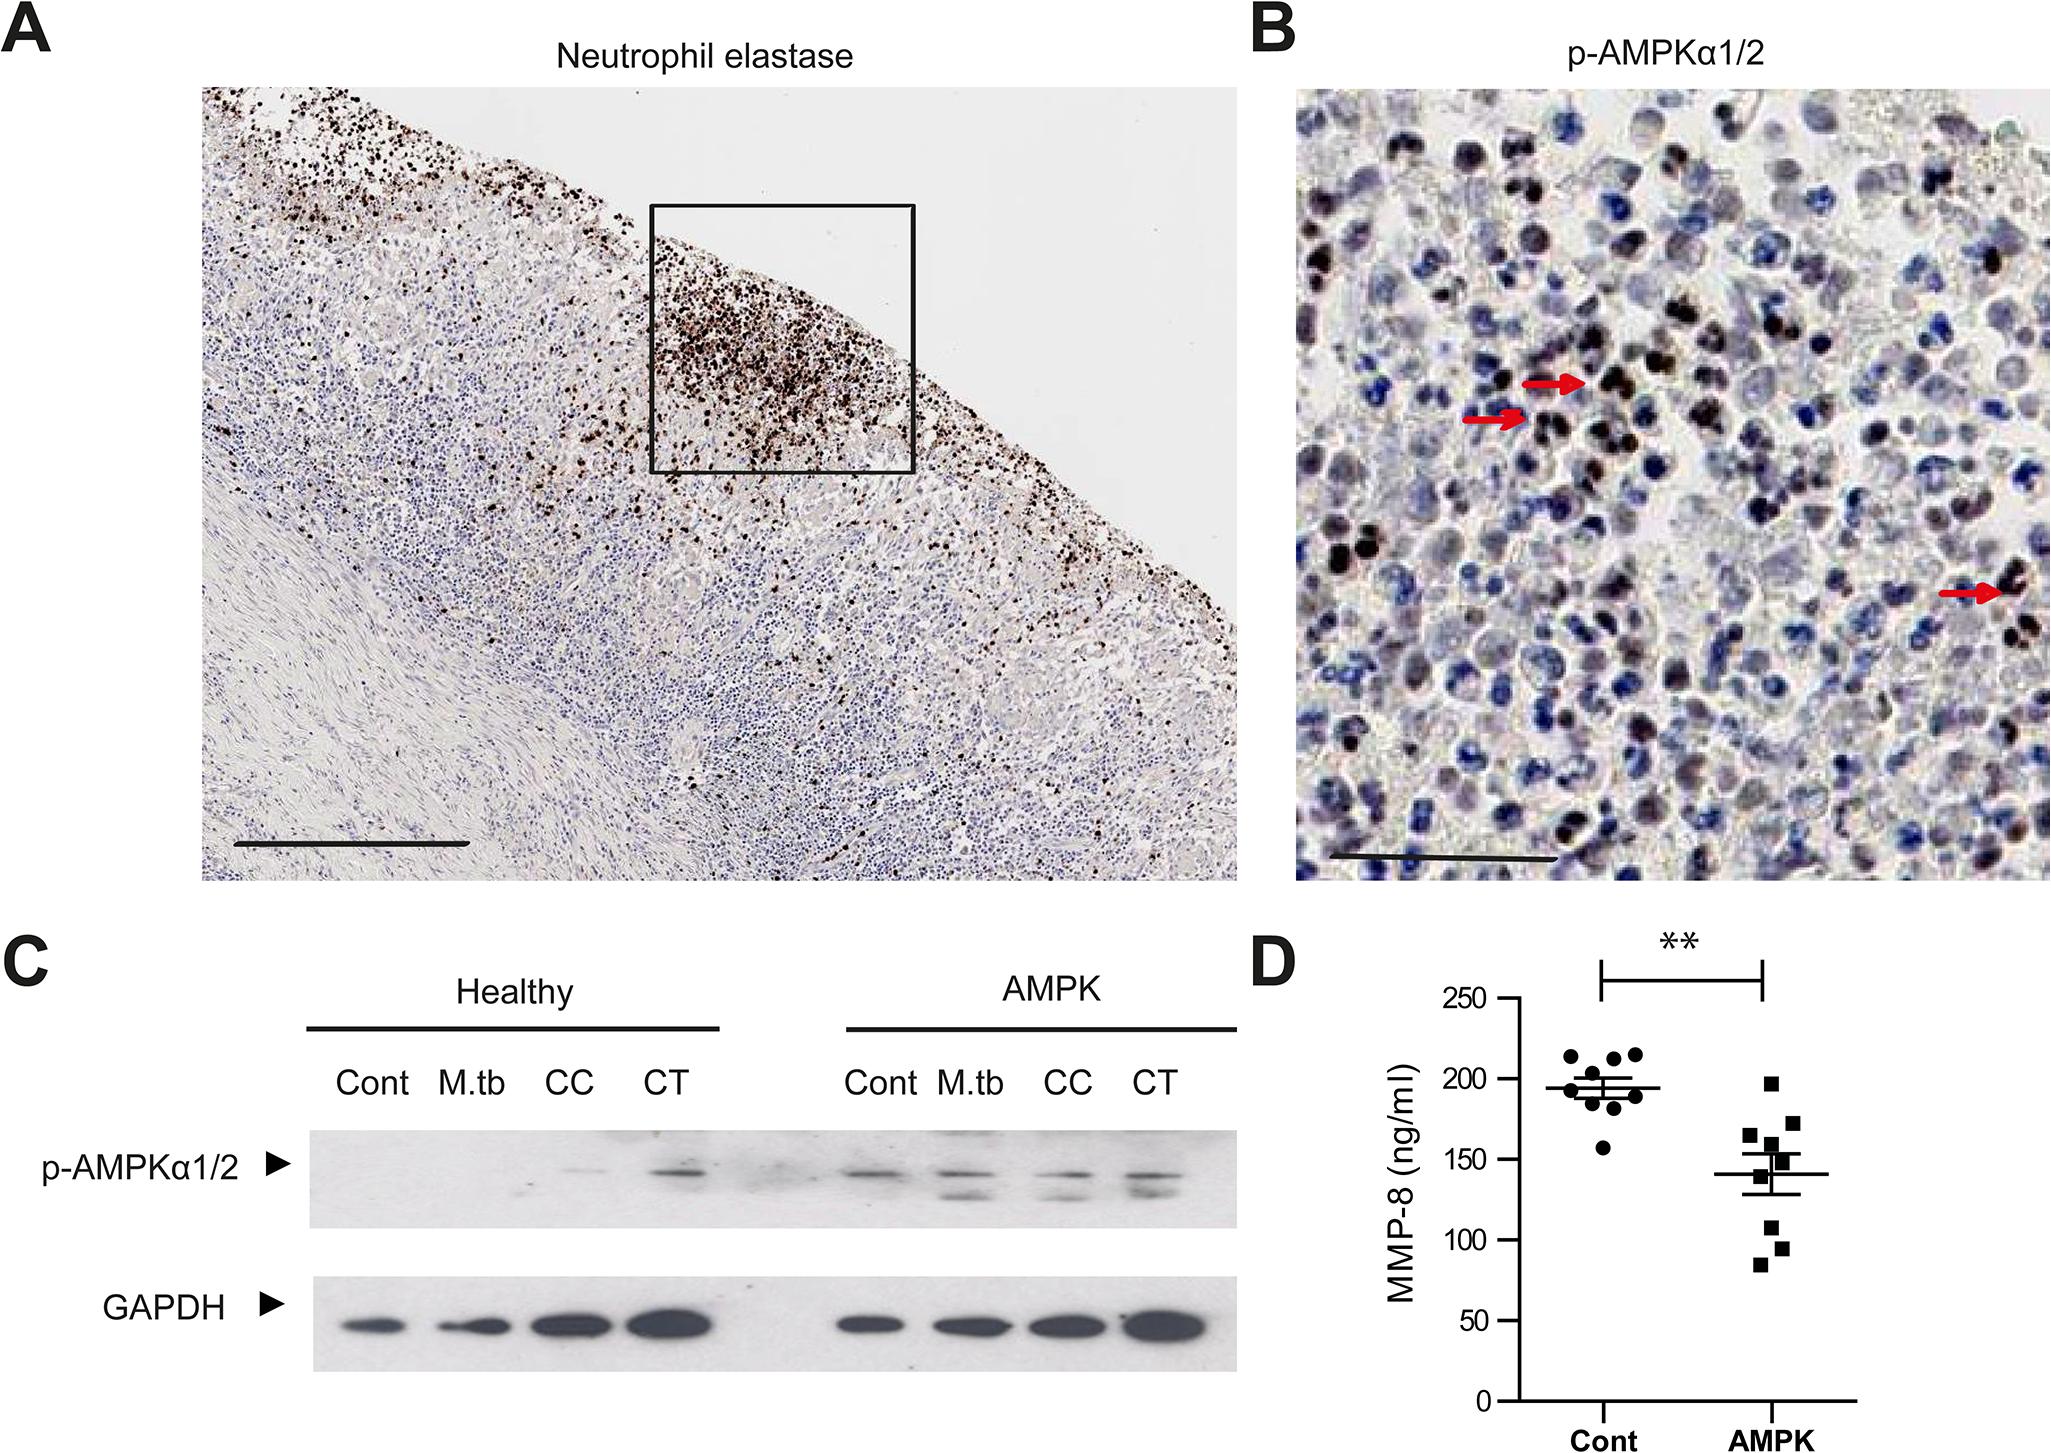 AMPK regulates neutrophil MMP-8 secretion in patients.